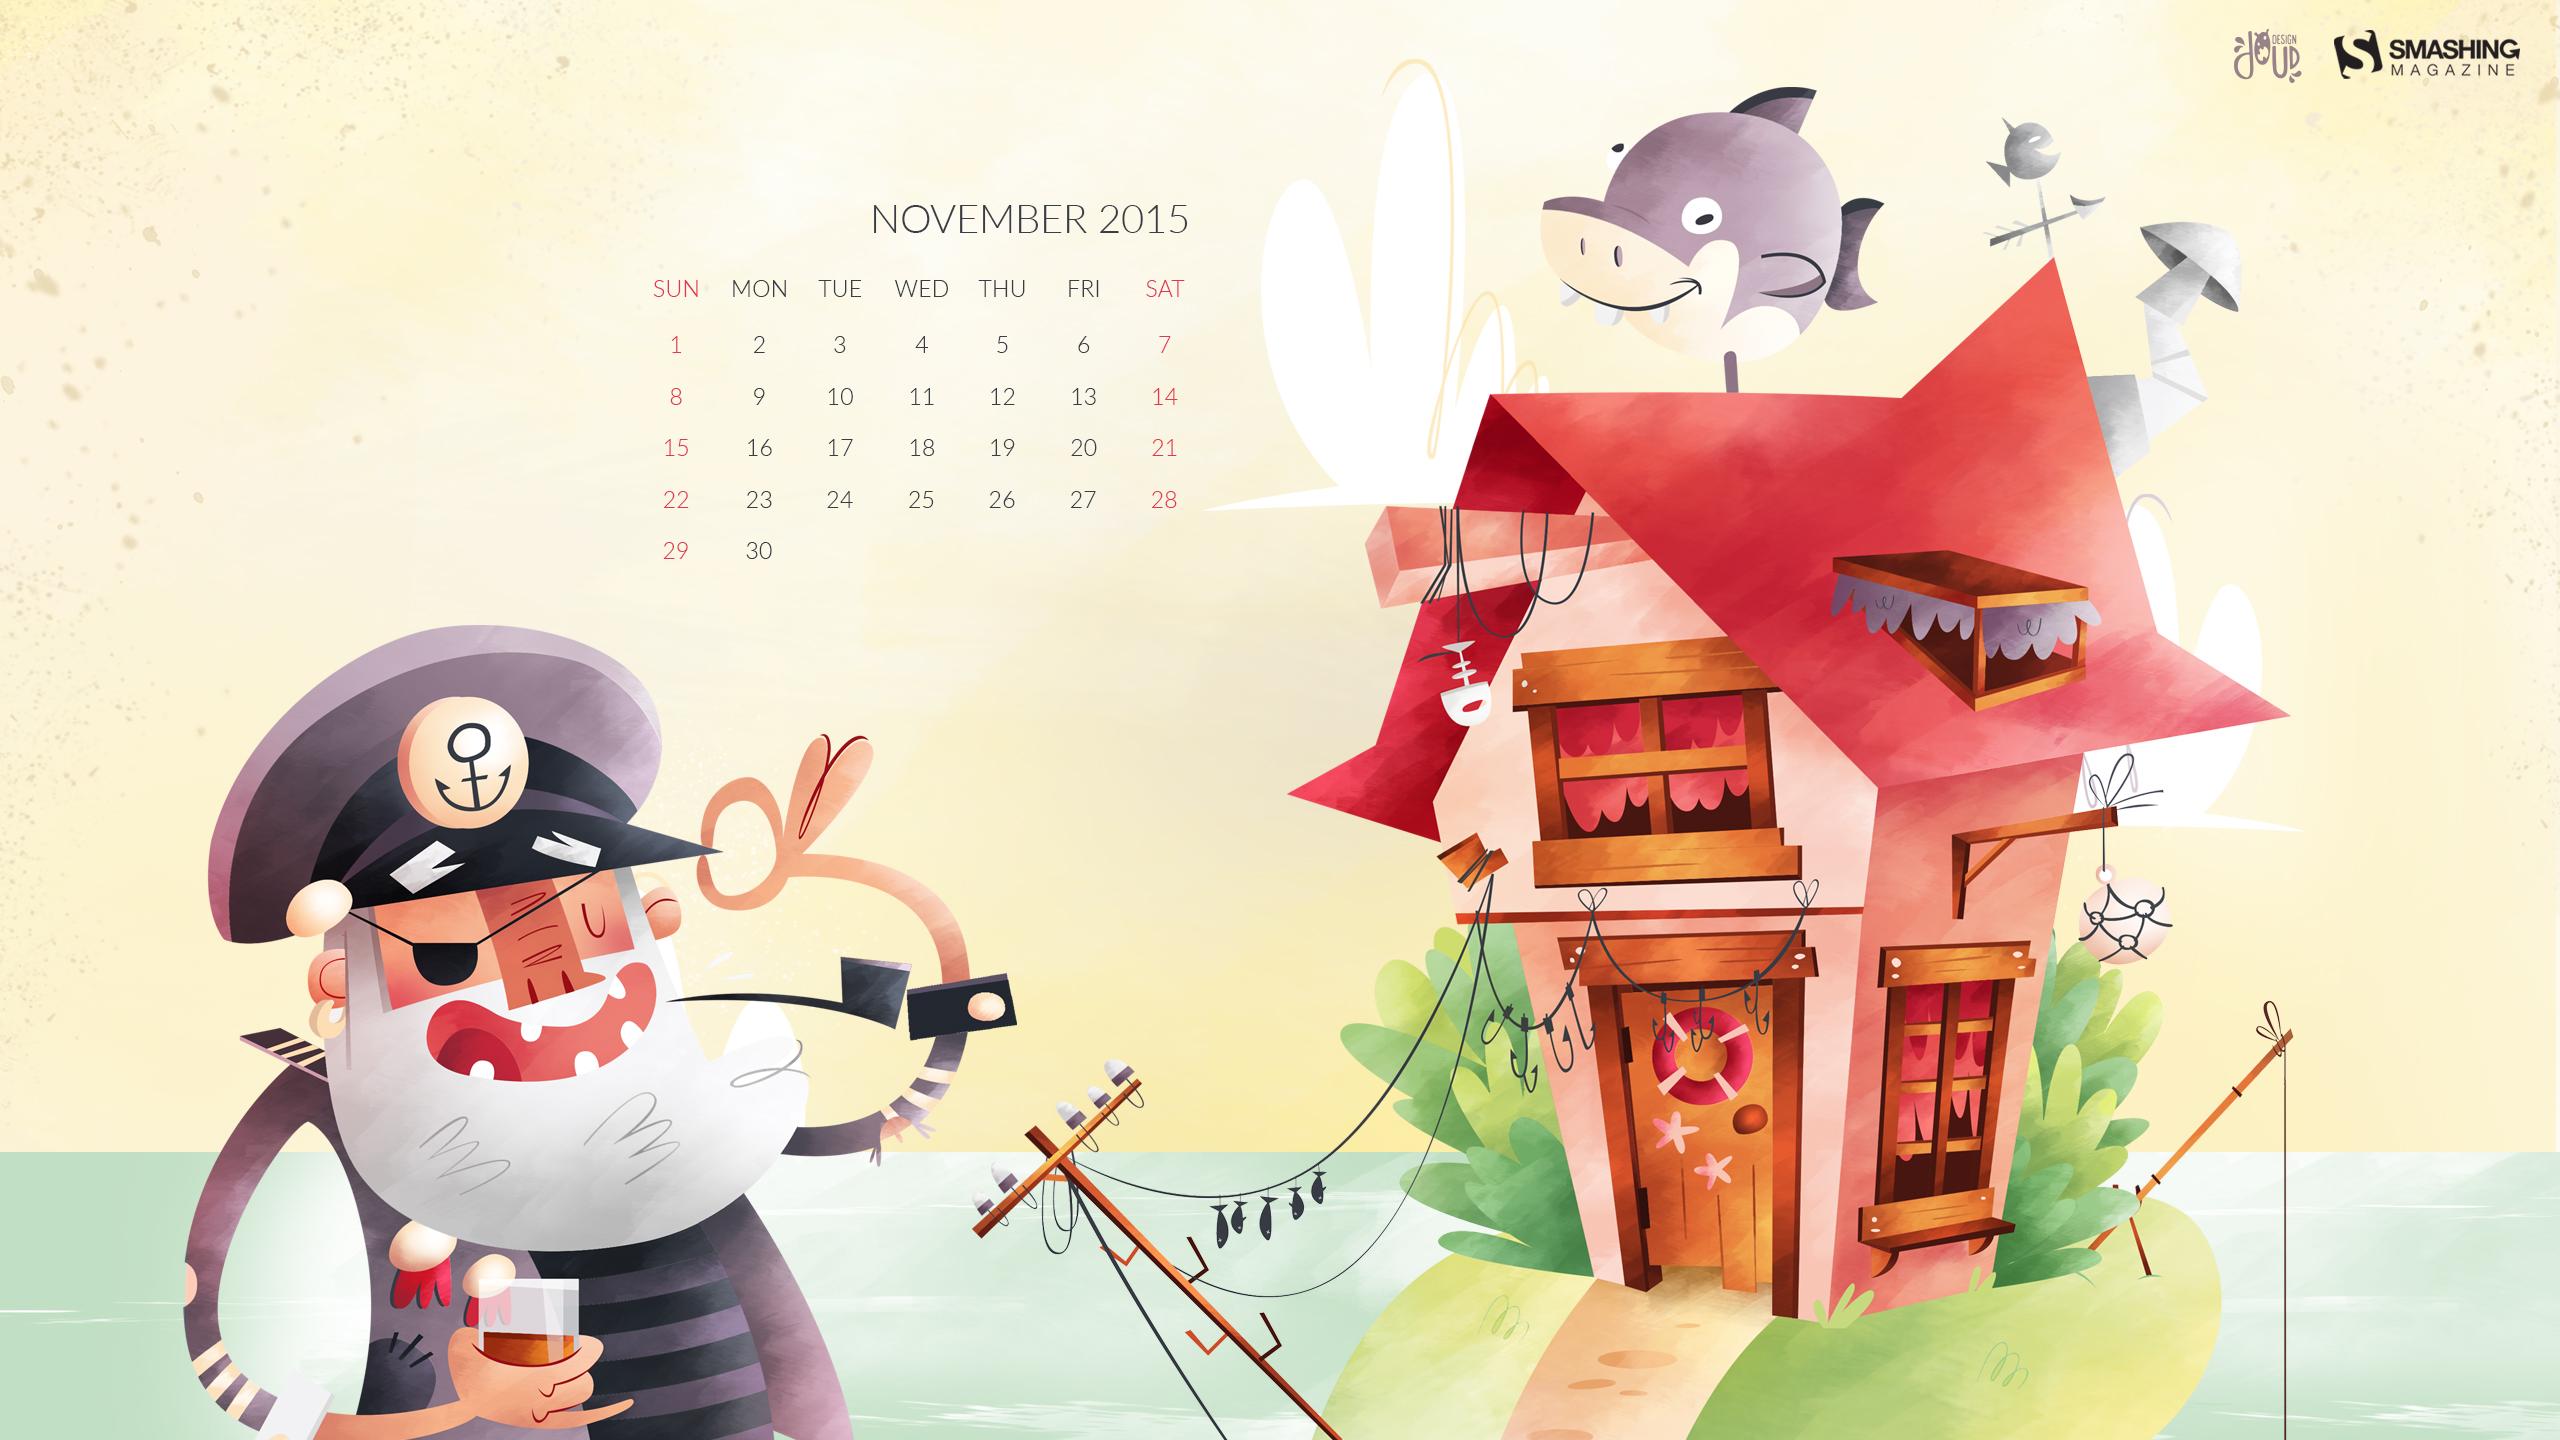 Calendar Wallpaper Smashing Magazine : Desktop wallpaper calendars november — smashing magazine